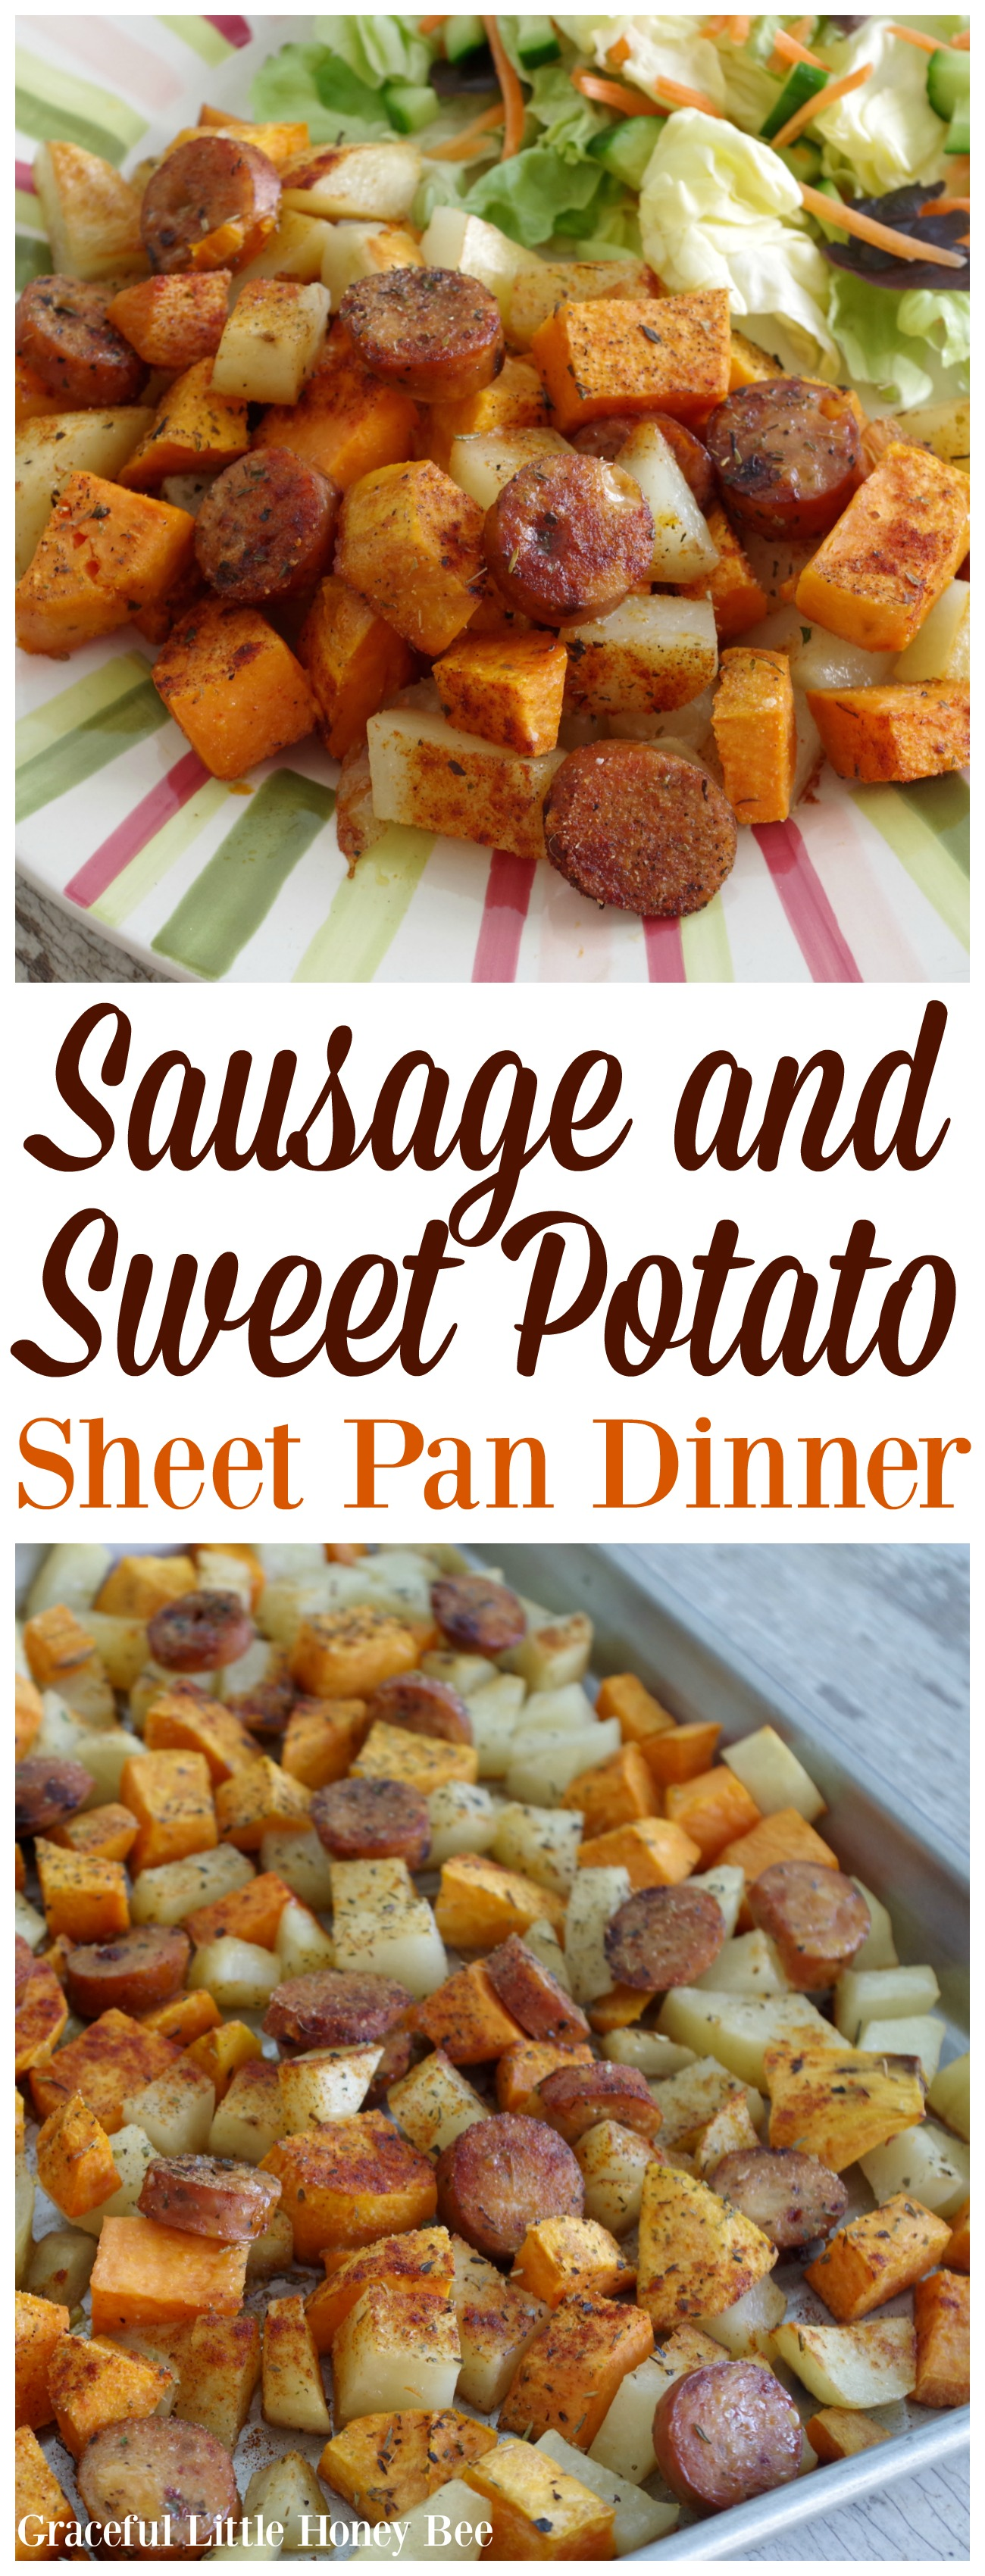 Sausage And Sweet Potato Sheet Pan Dinner Graceful Little Honey Bee